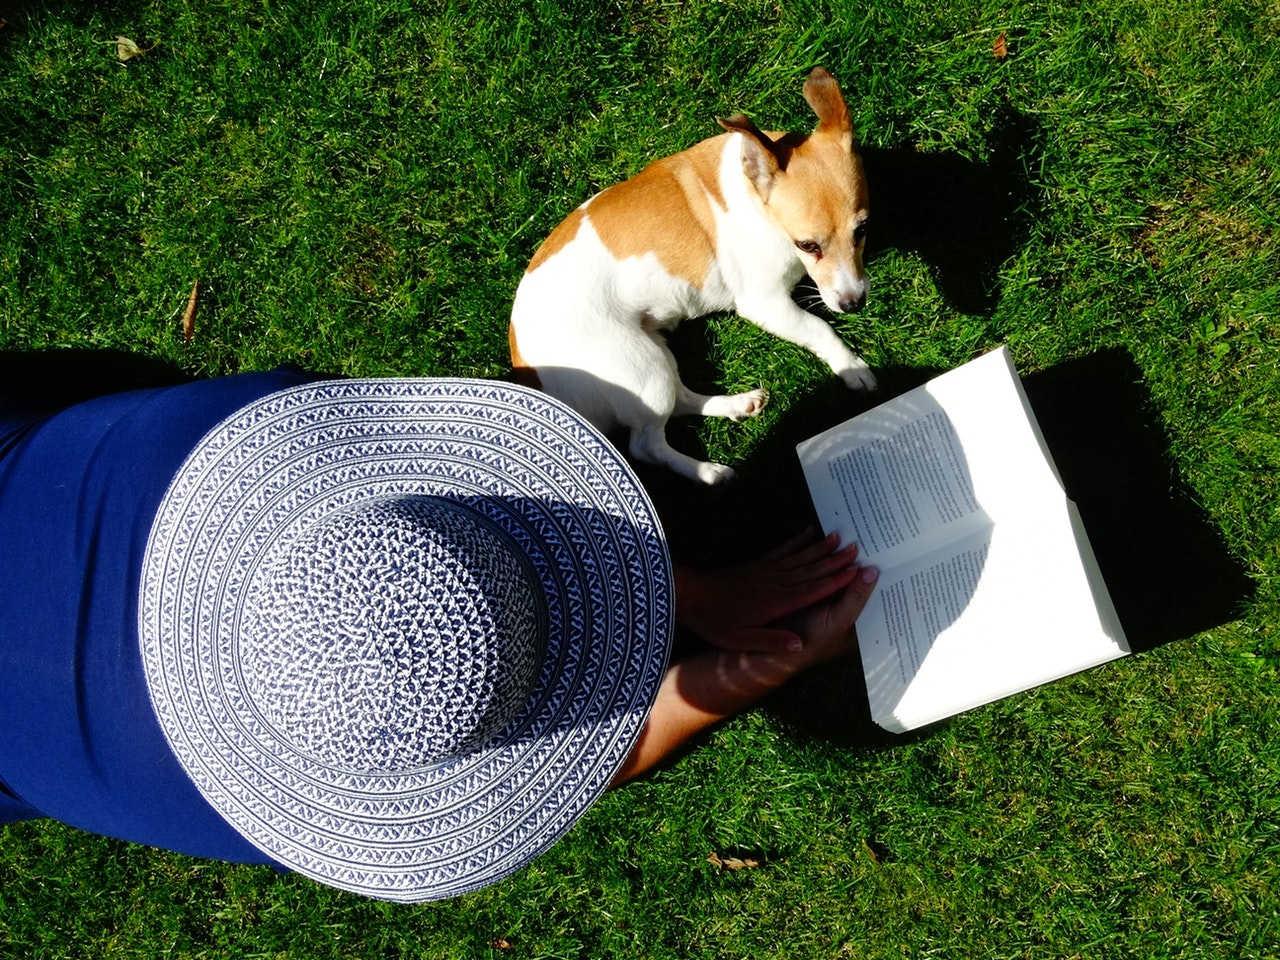 Hundebücher - Hundeerziehungs Bücher